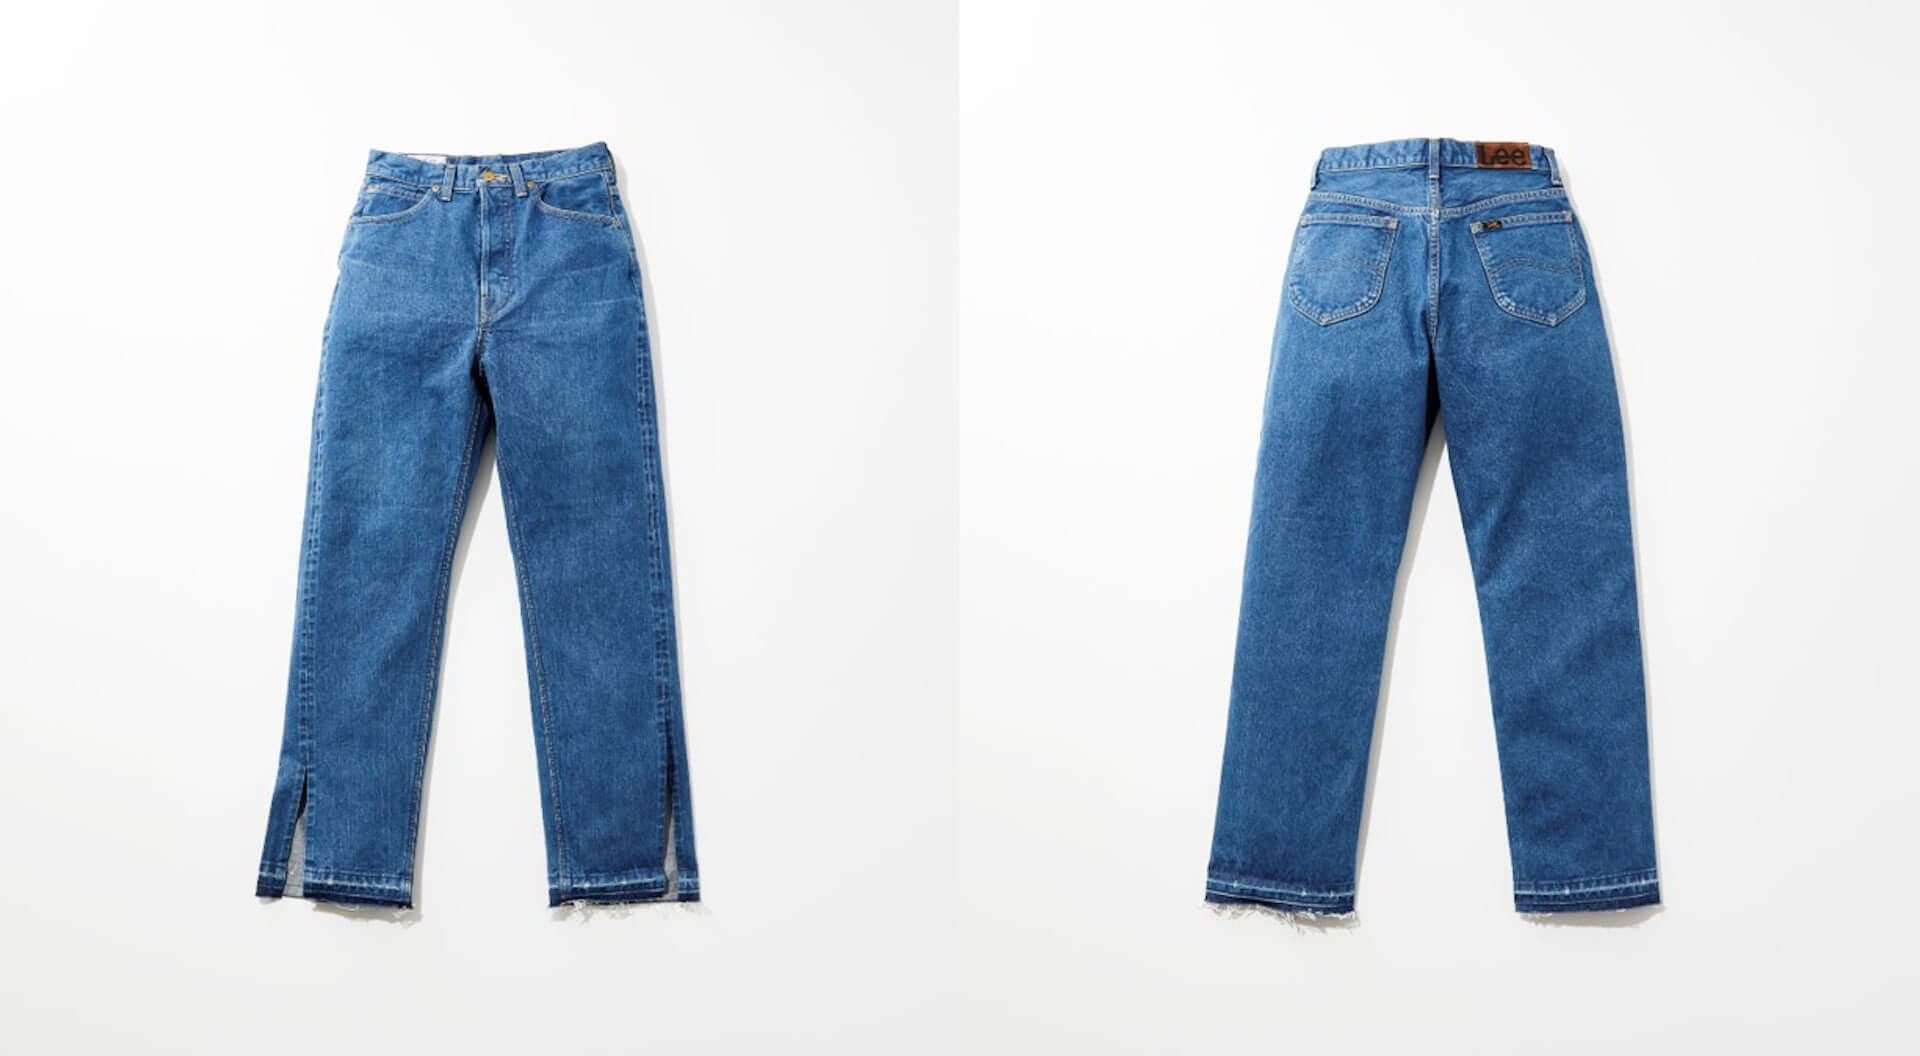 "Leeと竹下玲奈による初のコラボアイテムが登場!""大人の女性""のためのジーンズ、カットソー、オーバーオールなど全5型 lf210310_lee_8-1920x1056"